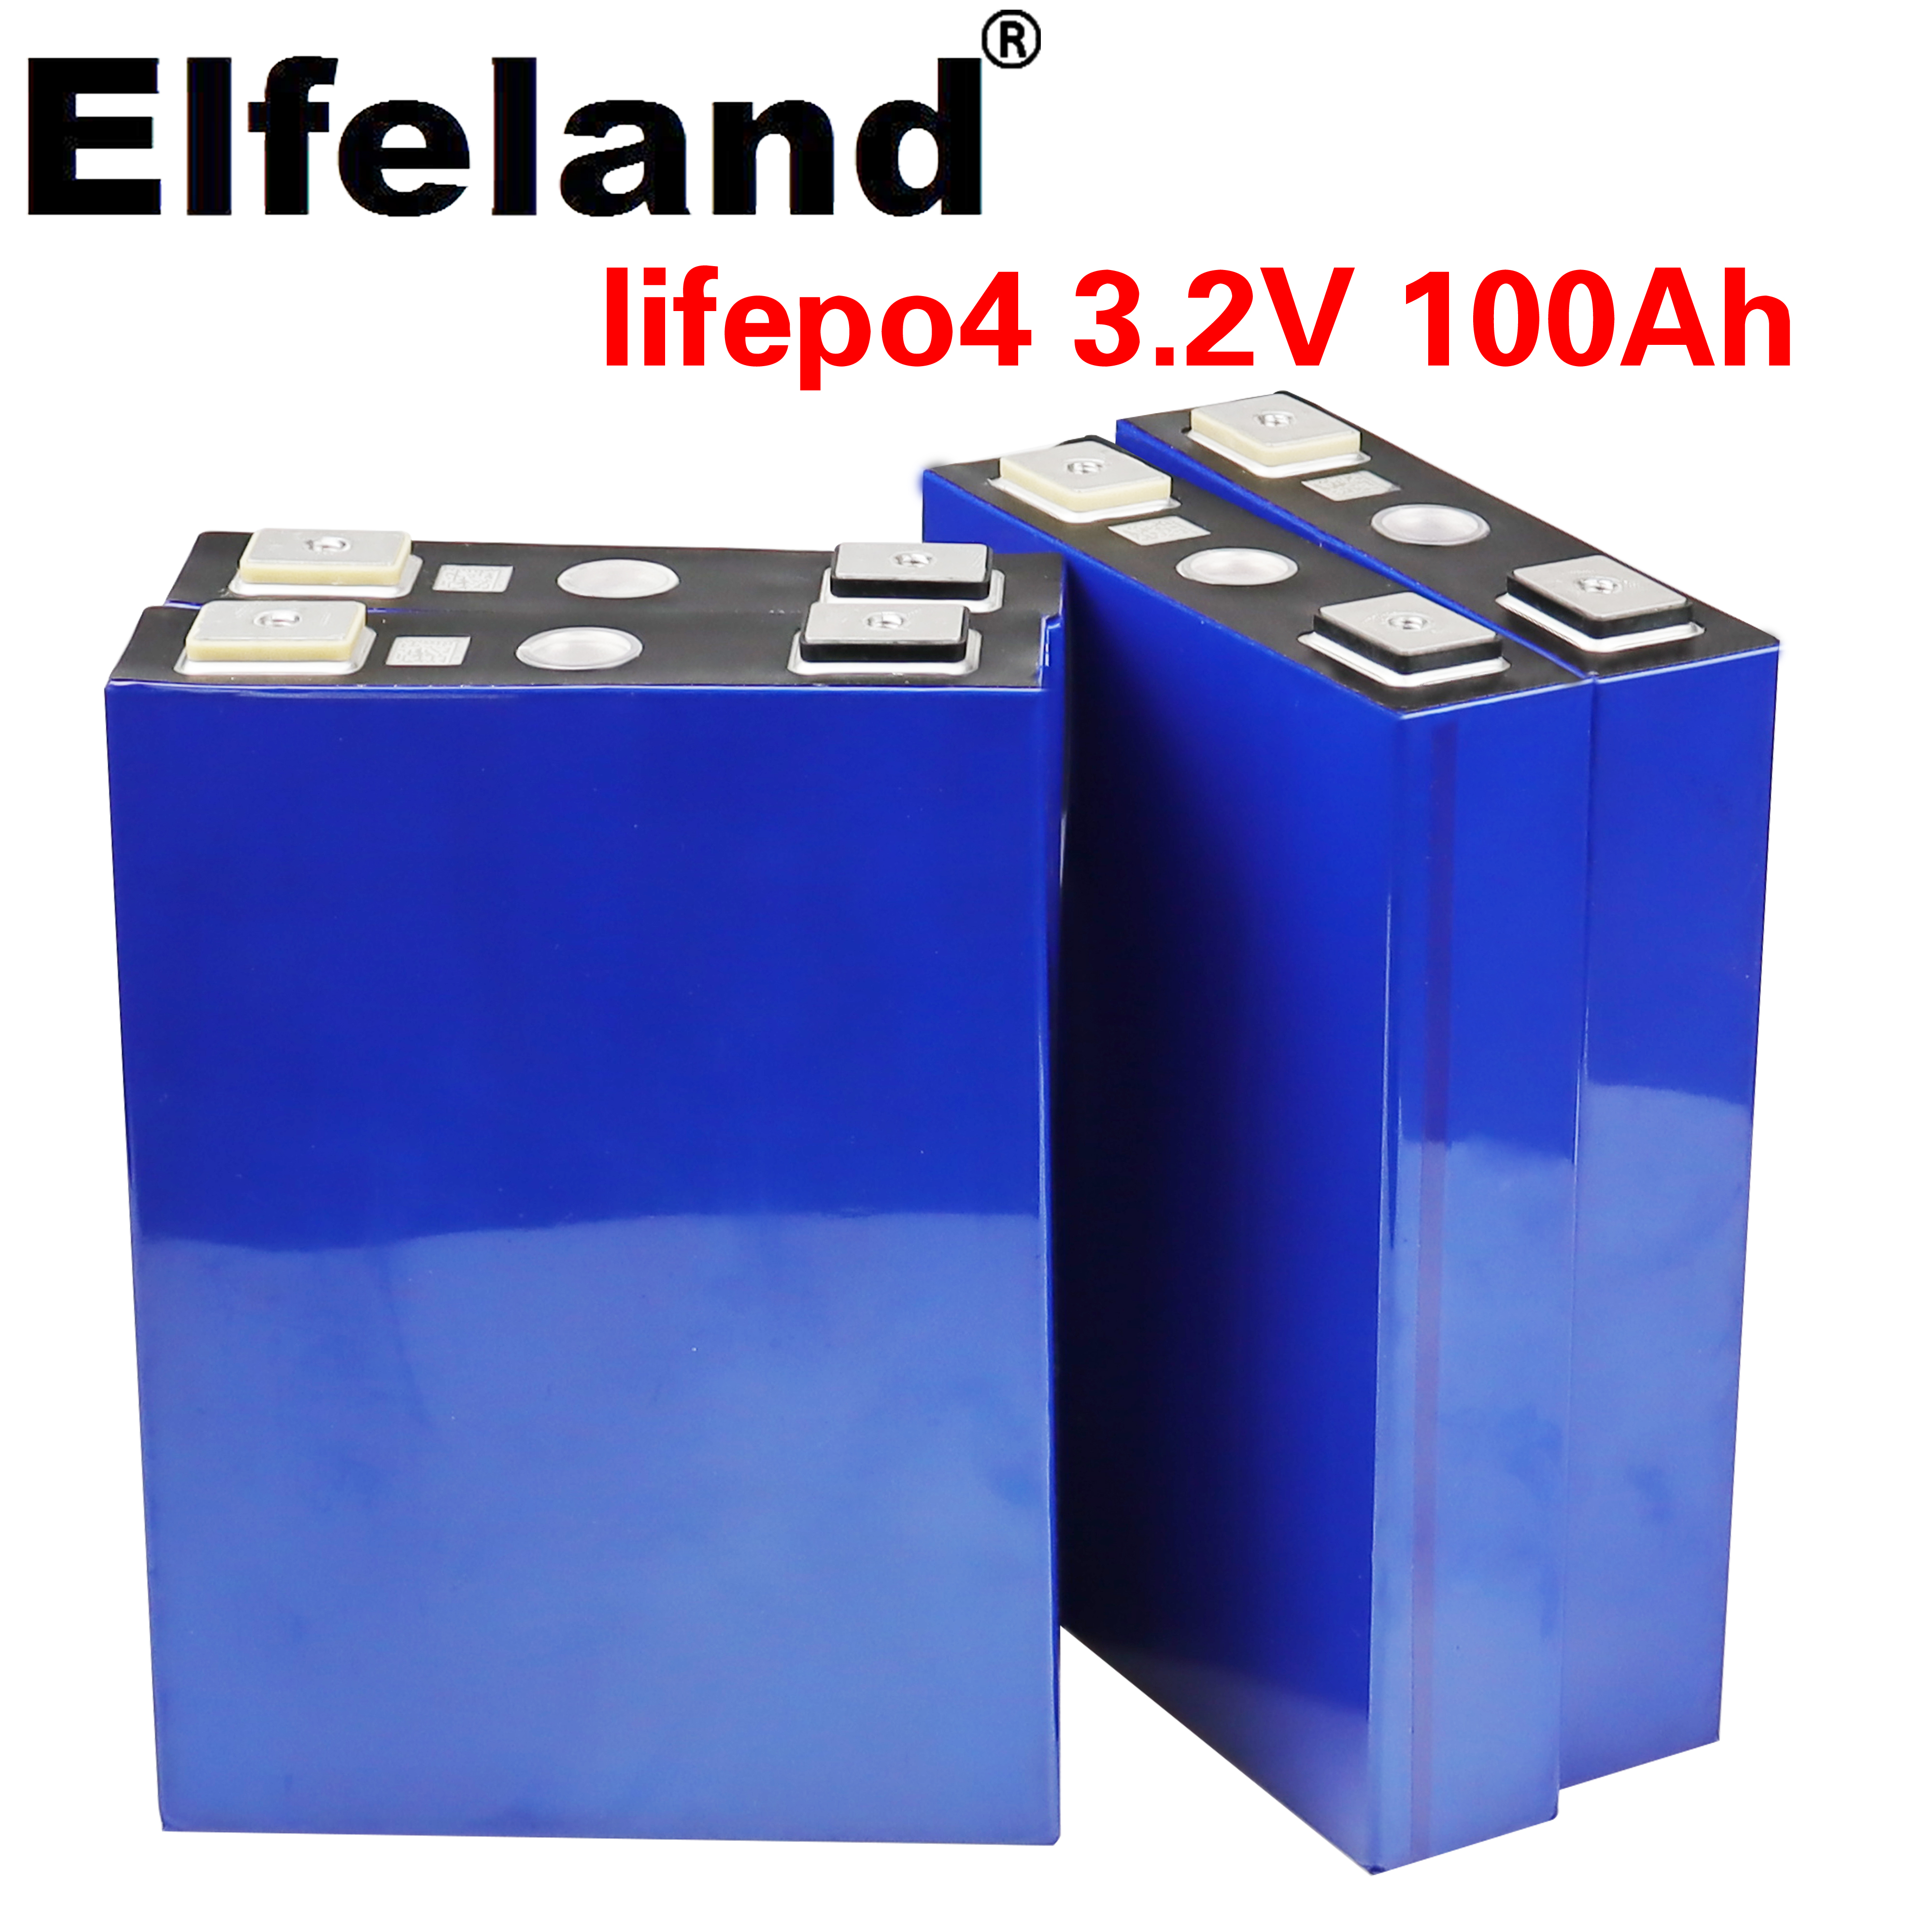 Elfeland 2020 neue 3,2 v 100Ah LifePo4 batterie lithium-12V 24V solar Inverter elektrische fahrzeug golf auto